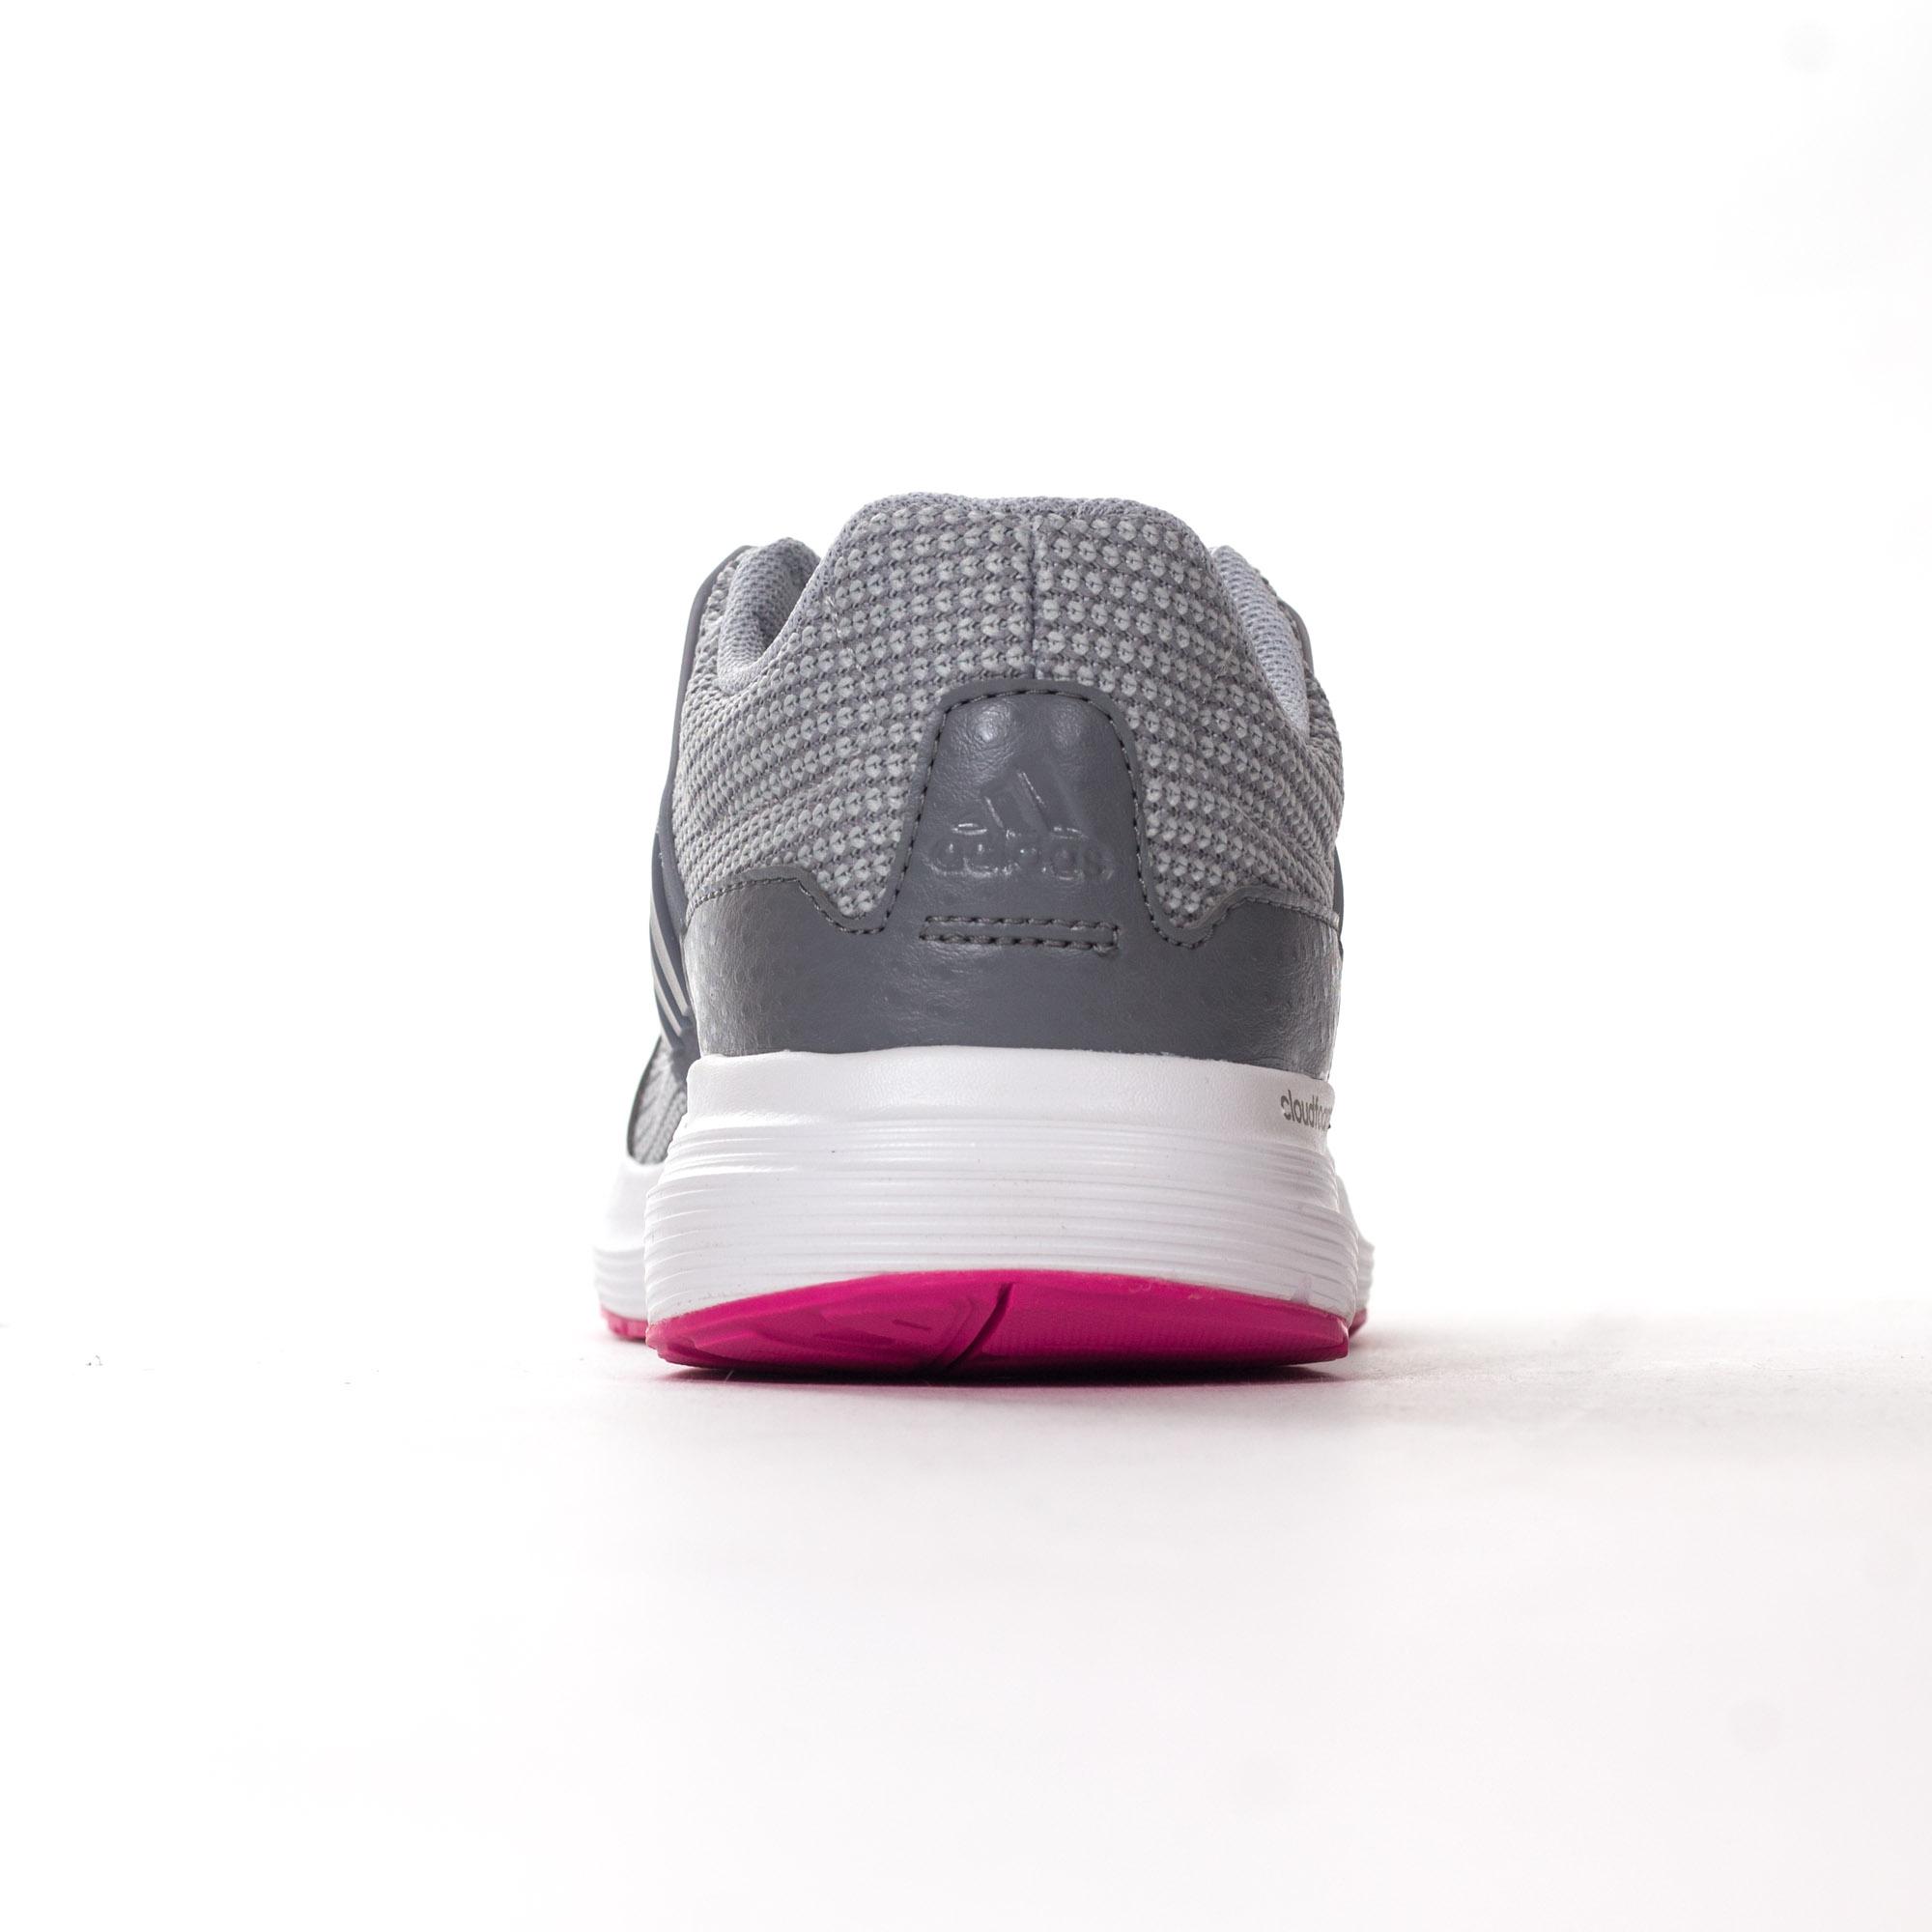 Nike Mercurial Superfly V FG Chelsea Soccers Shoes Royalblue Black ... de85420968430